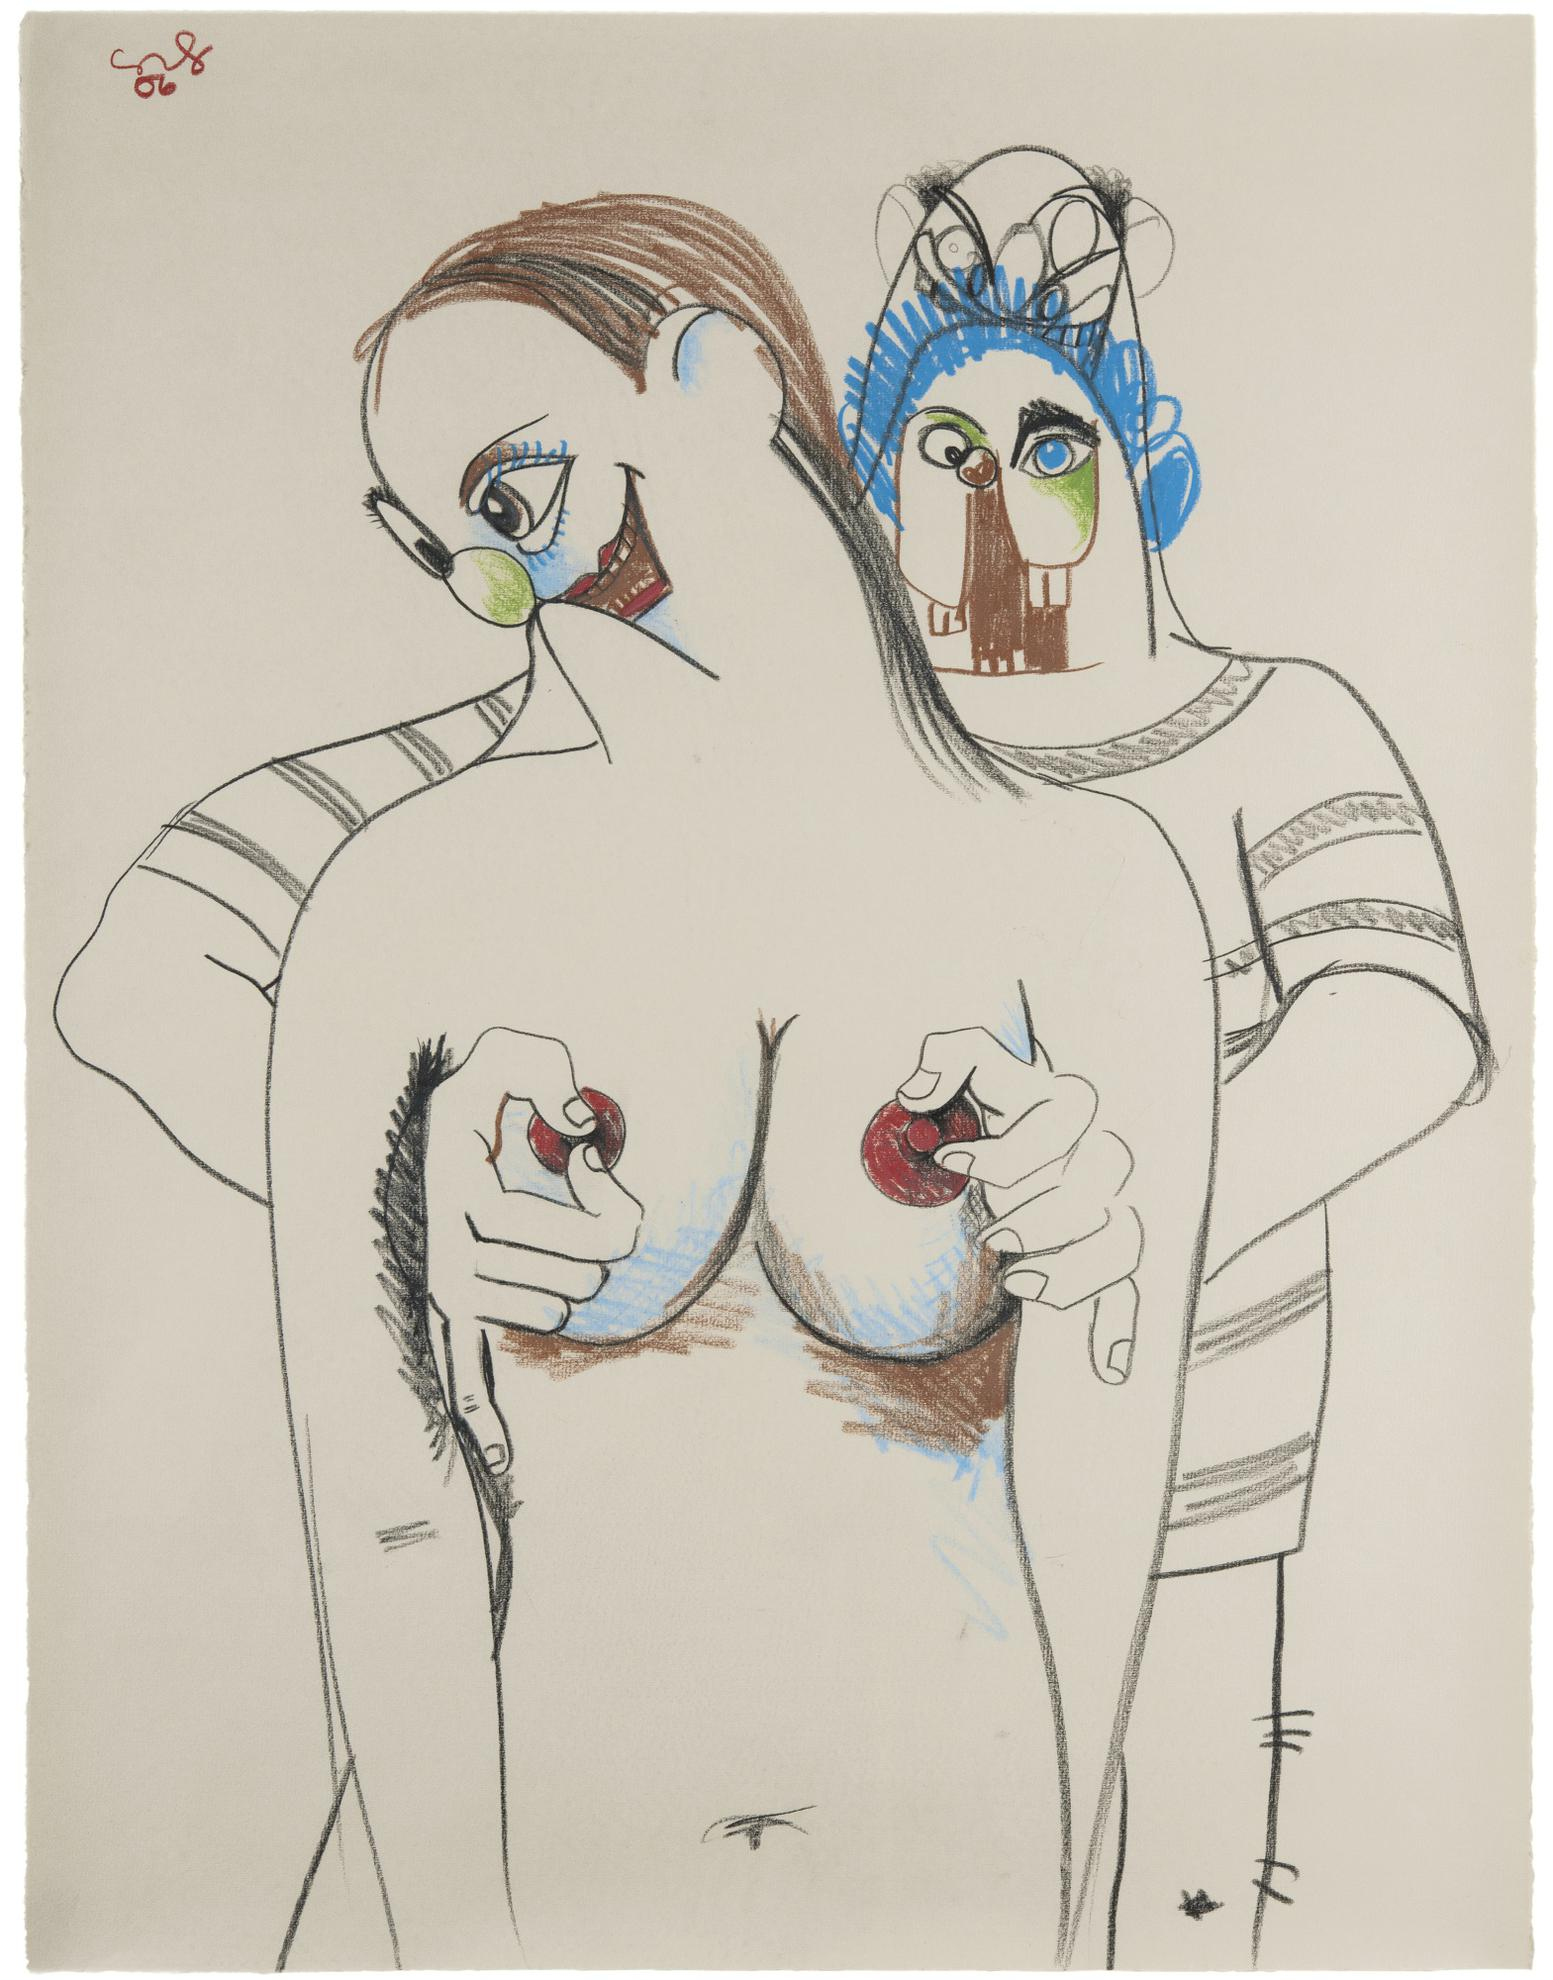 George Condo-Double Figure Composition-2006